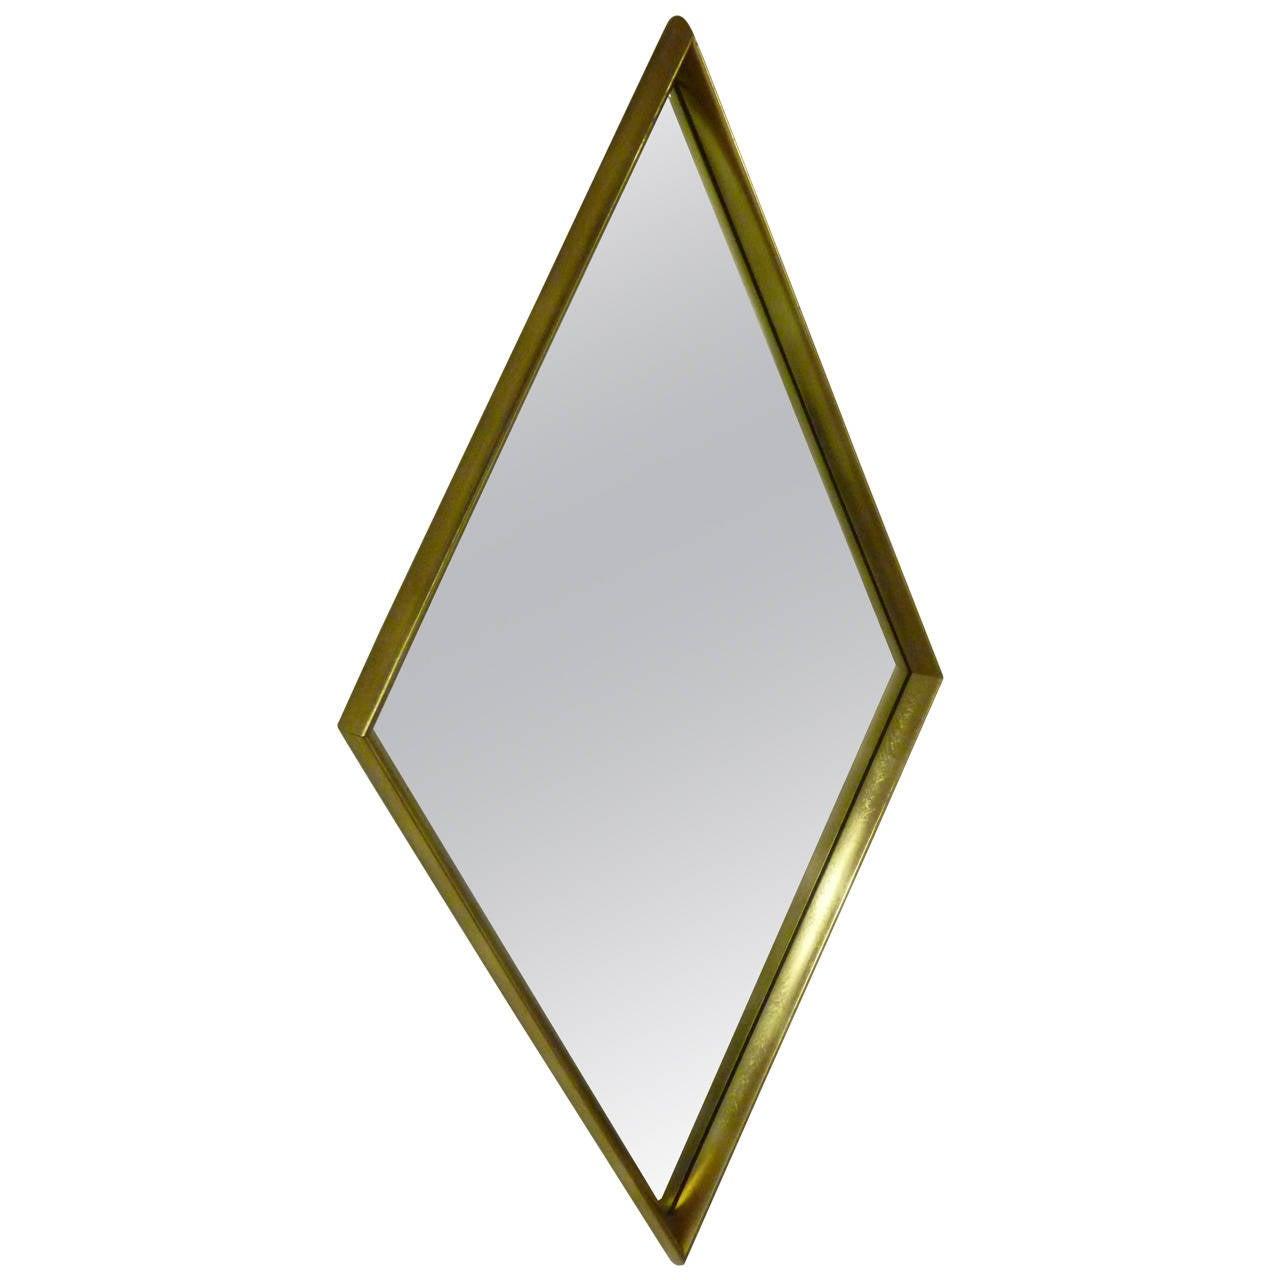 Modern Gold Leaf Diamond Mirror By La Barge At 1stdibs